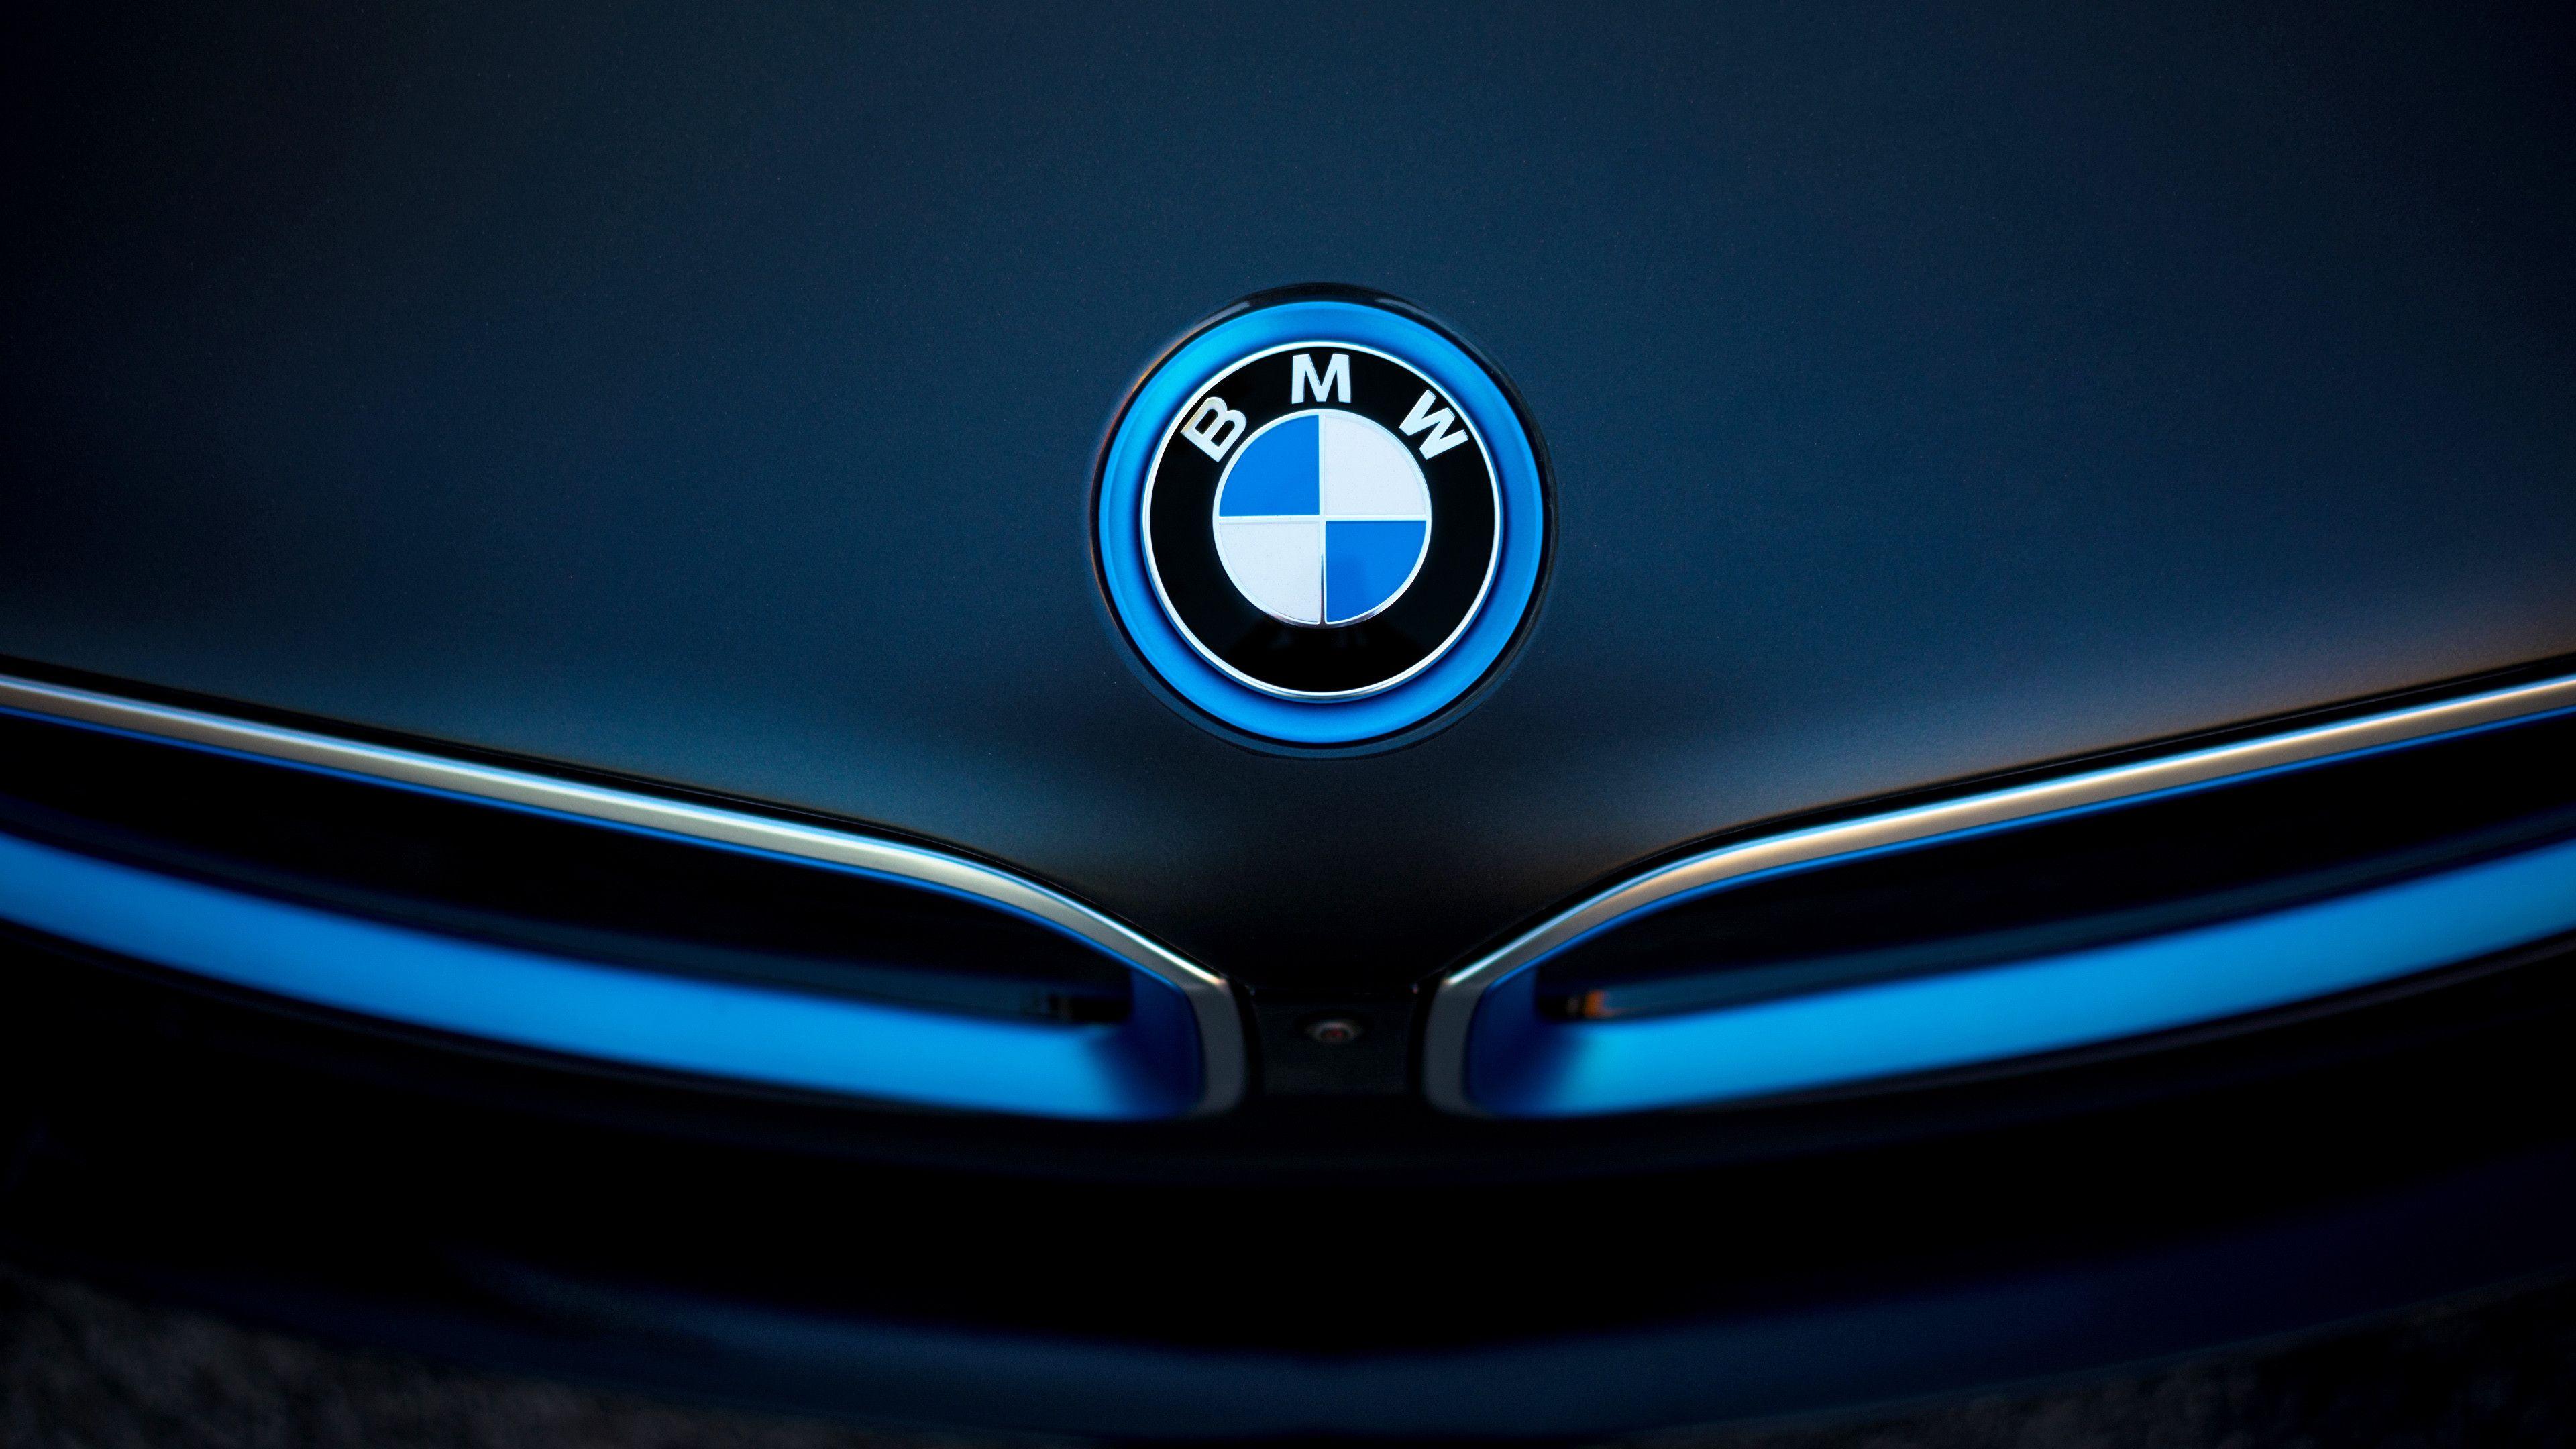 widescreen BMW Logo HD Wallpaper 3840x2160 Desktop Bmw